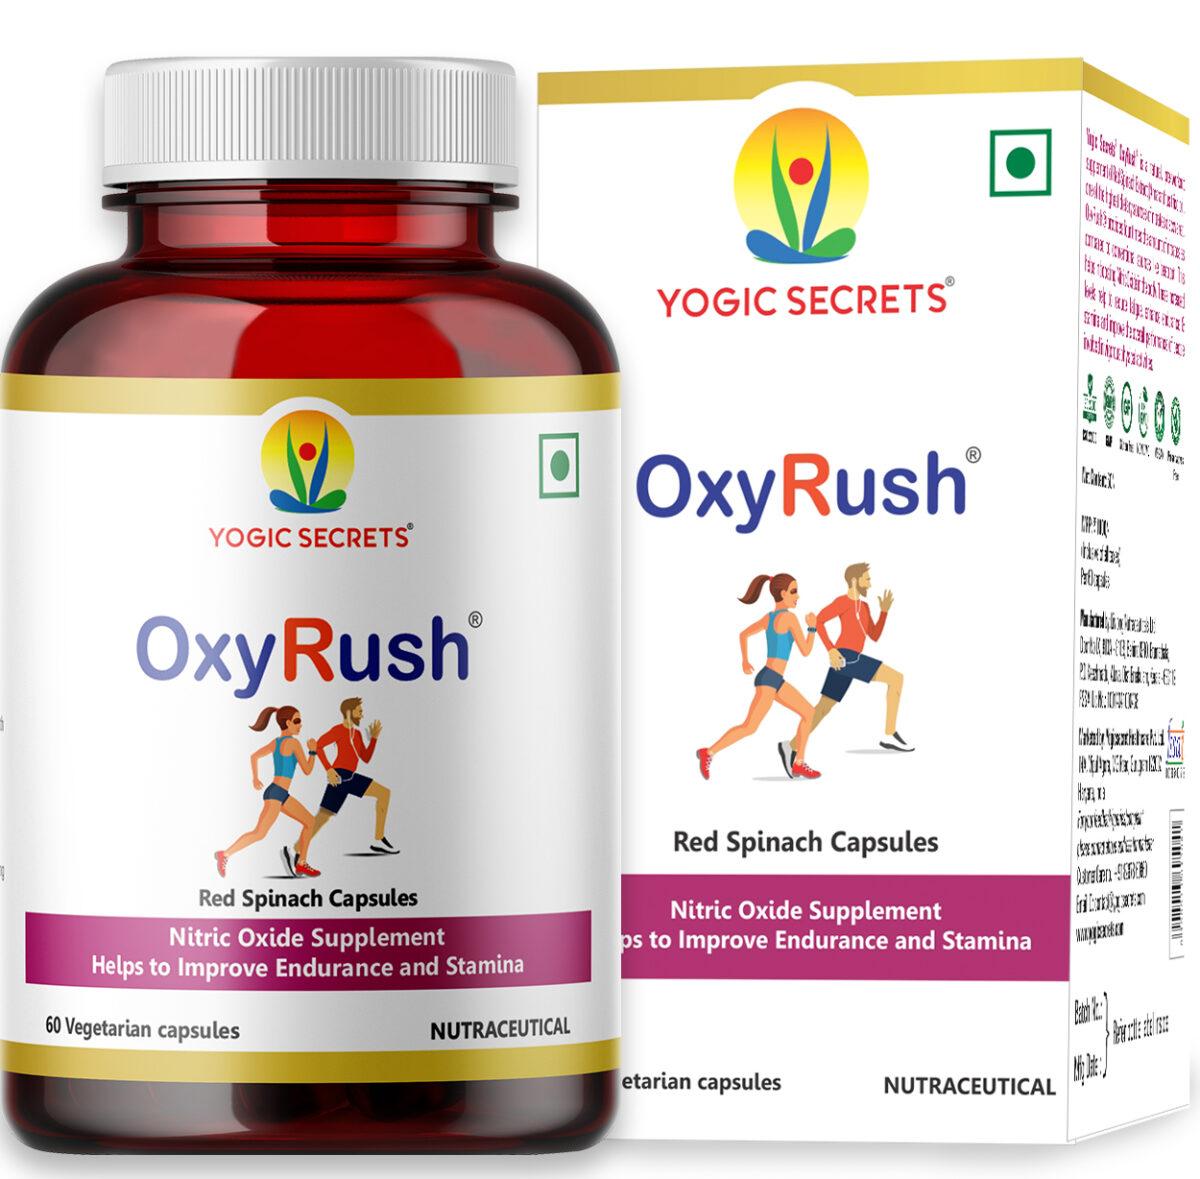 Oxyrush